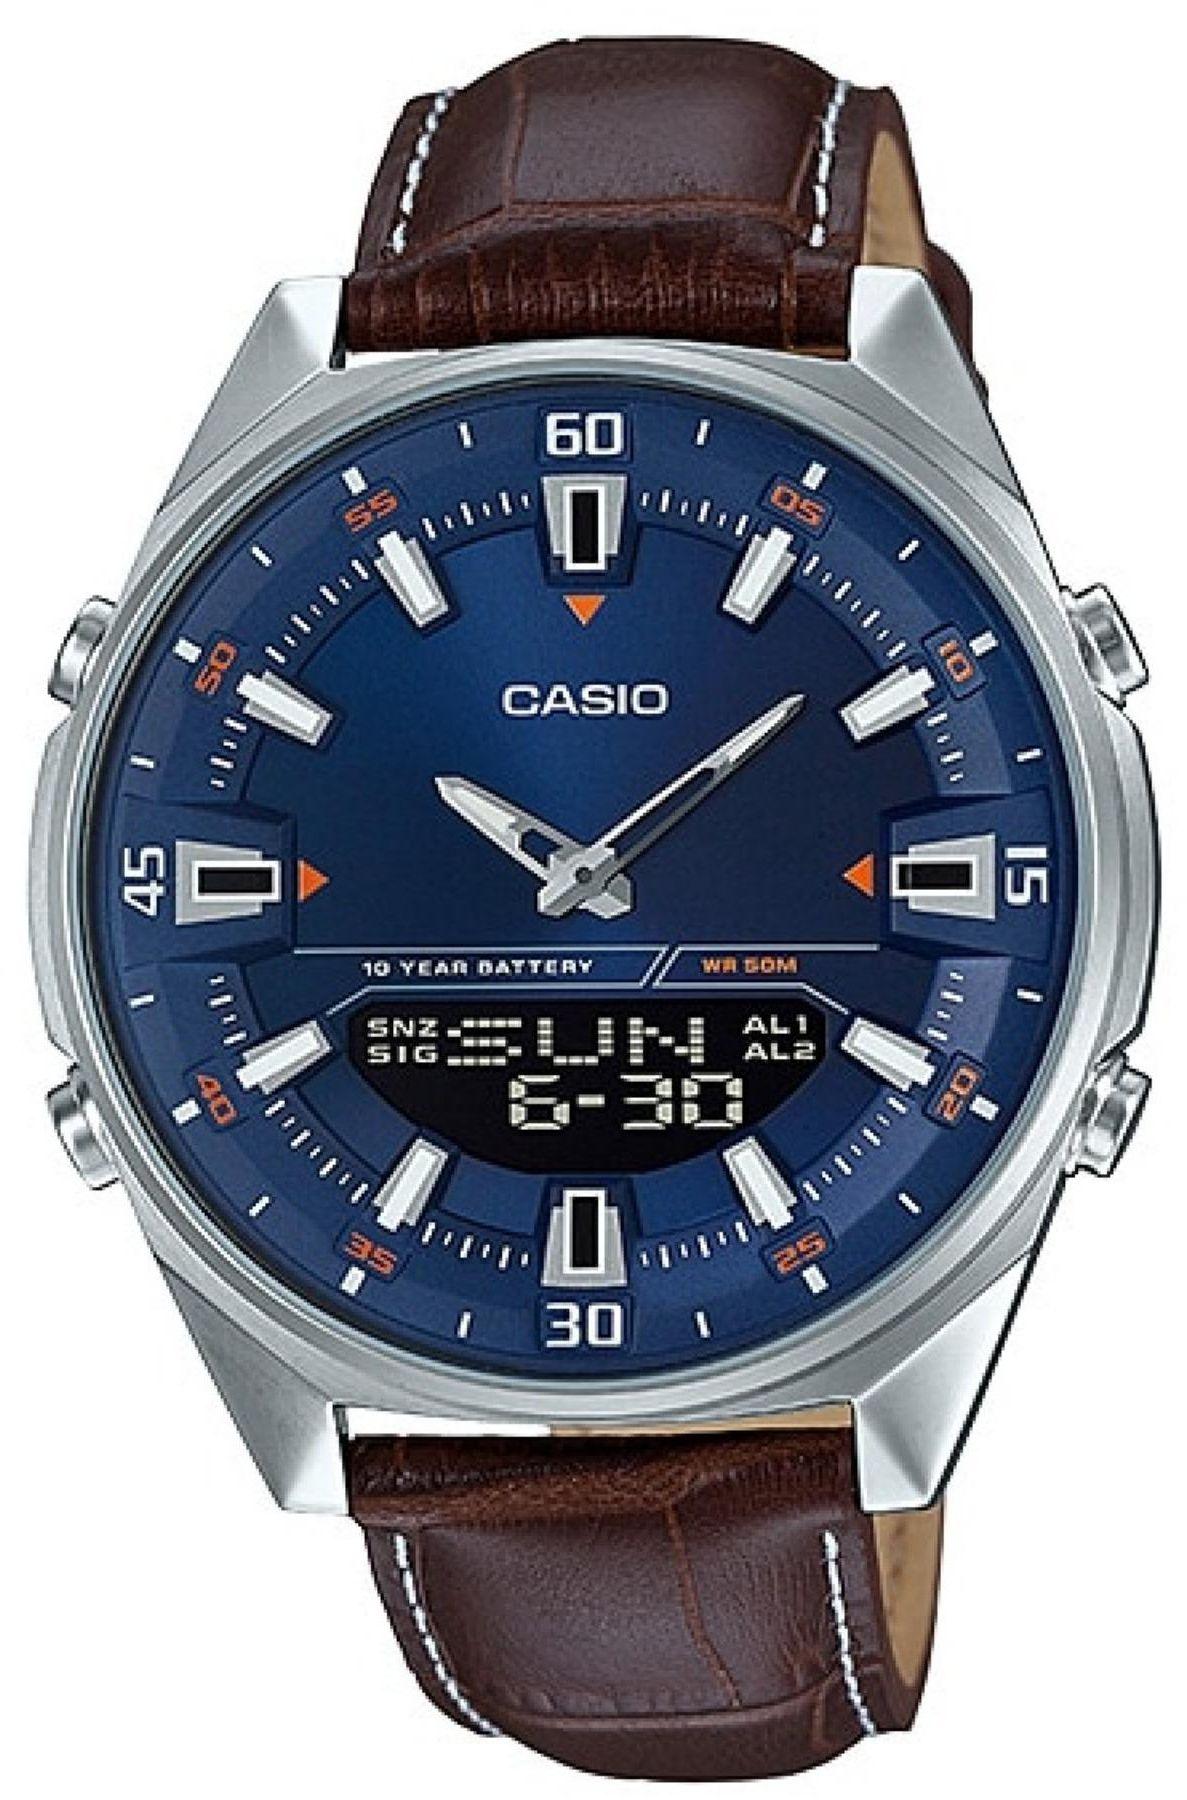 Casio AMW-830L-2AVDF Férfi karóra – Karóra Shop 5e5a5fd9eb